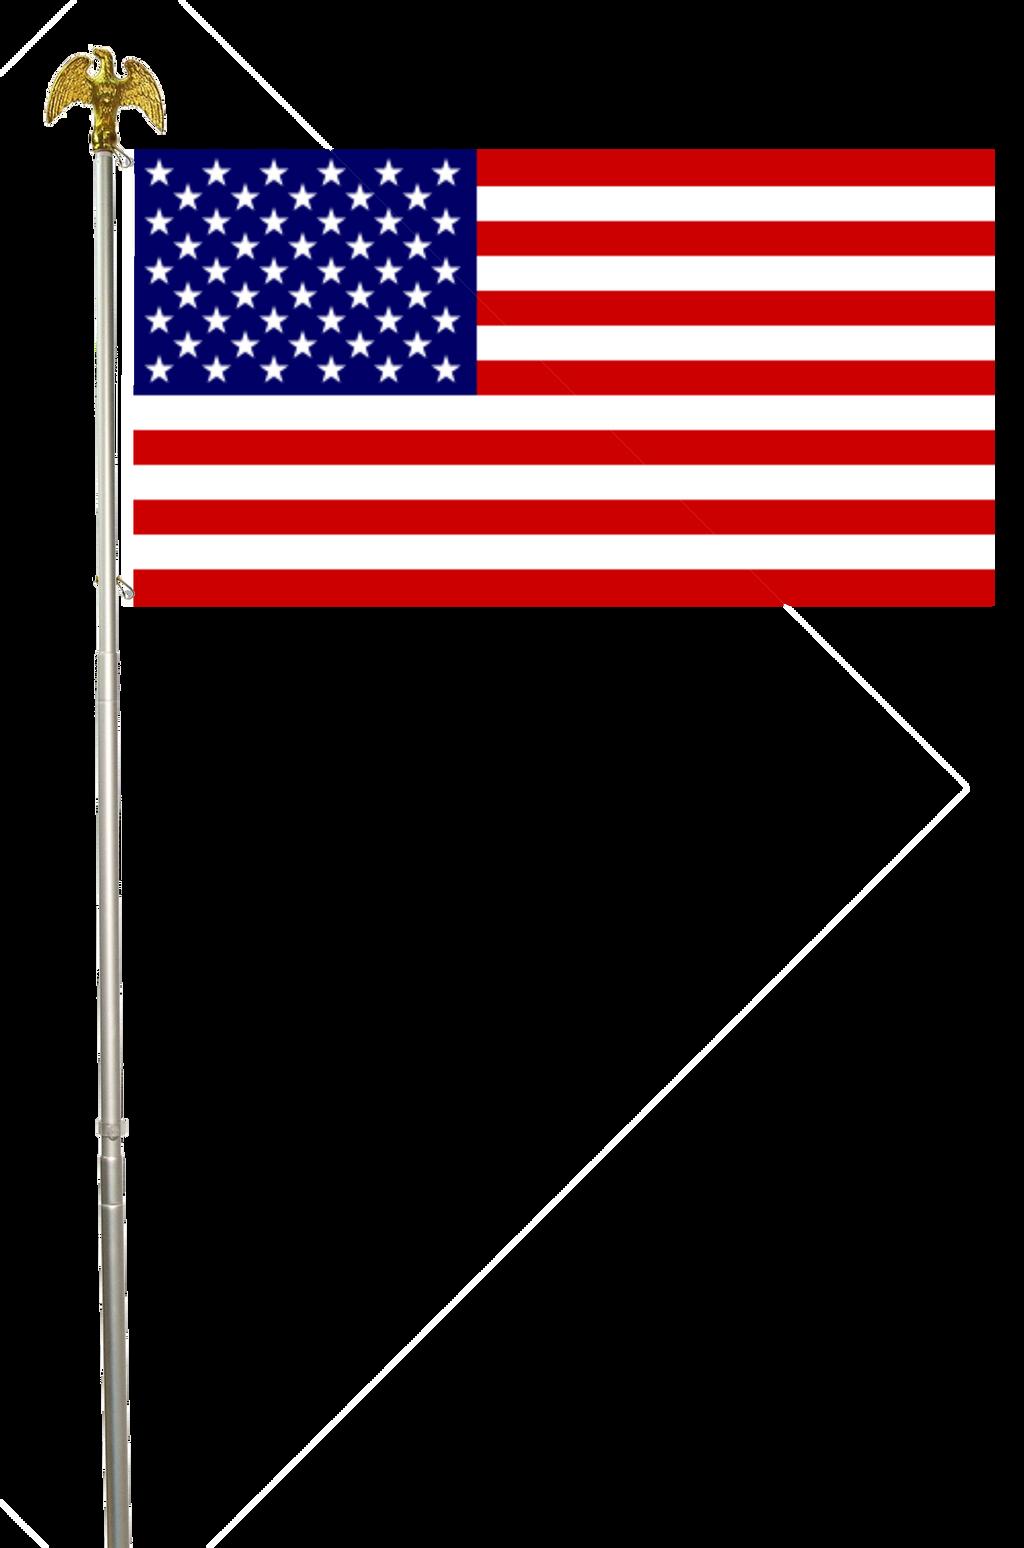 american flag pole png wwwpixsharkcom images